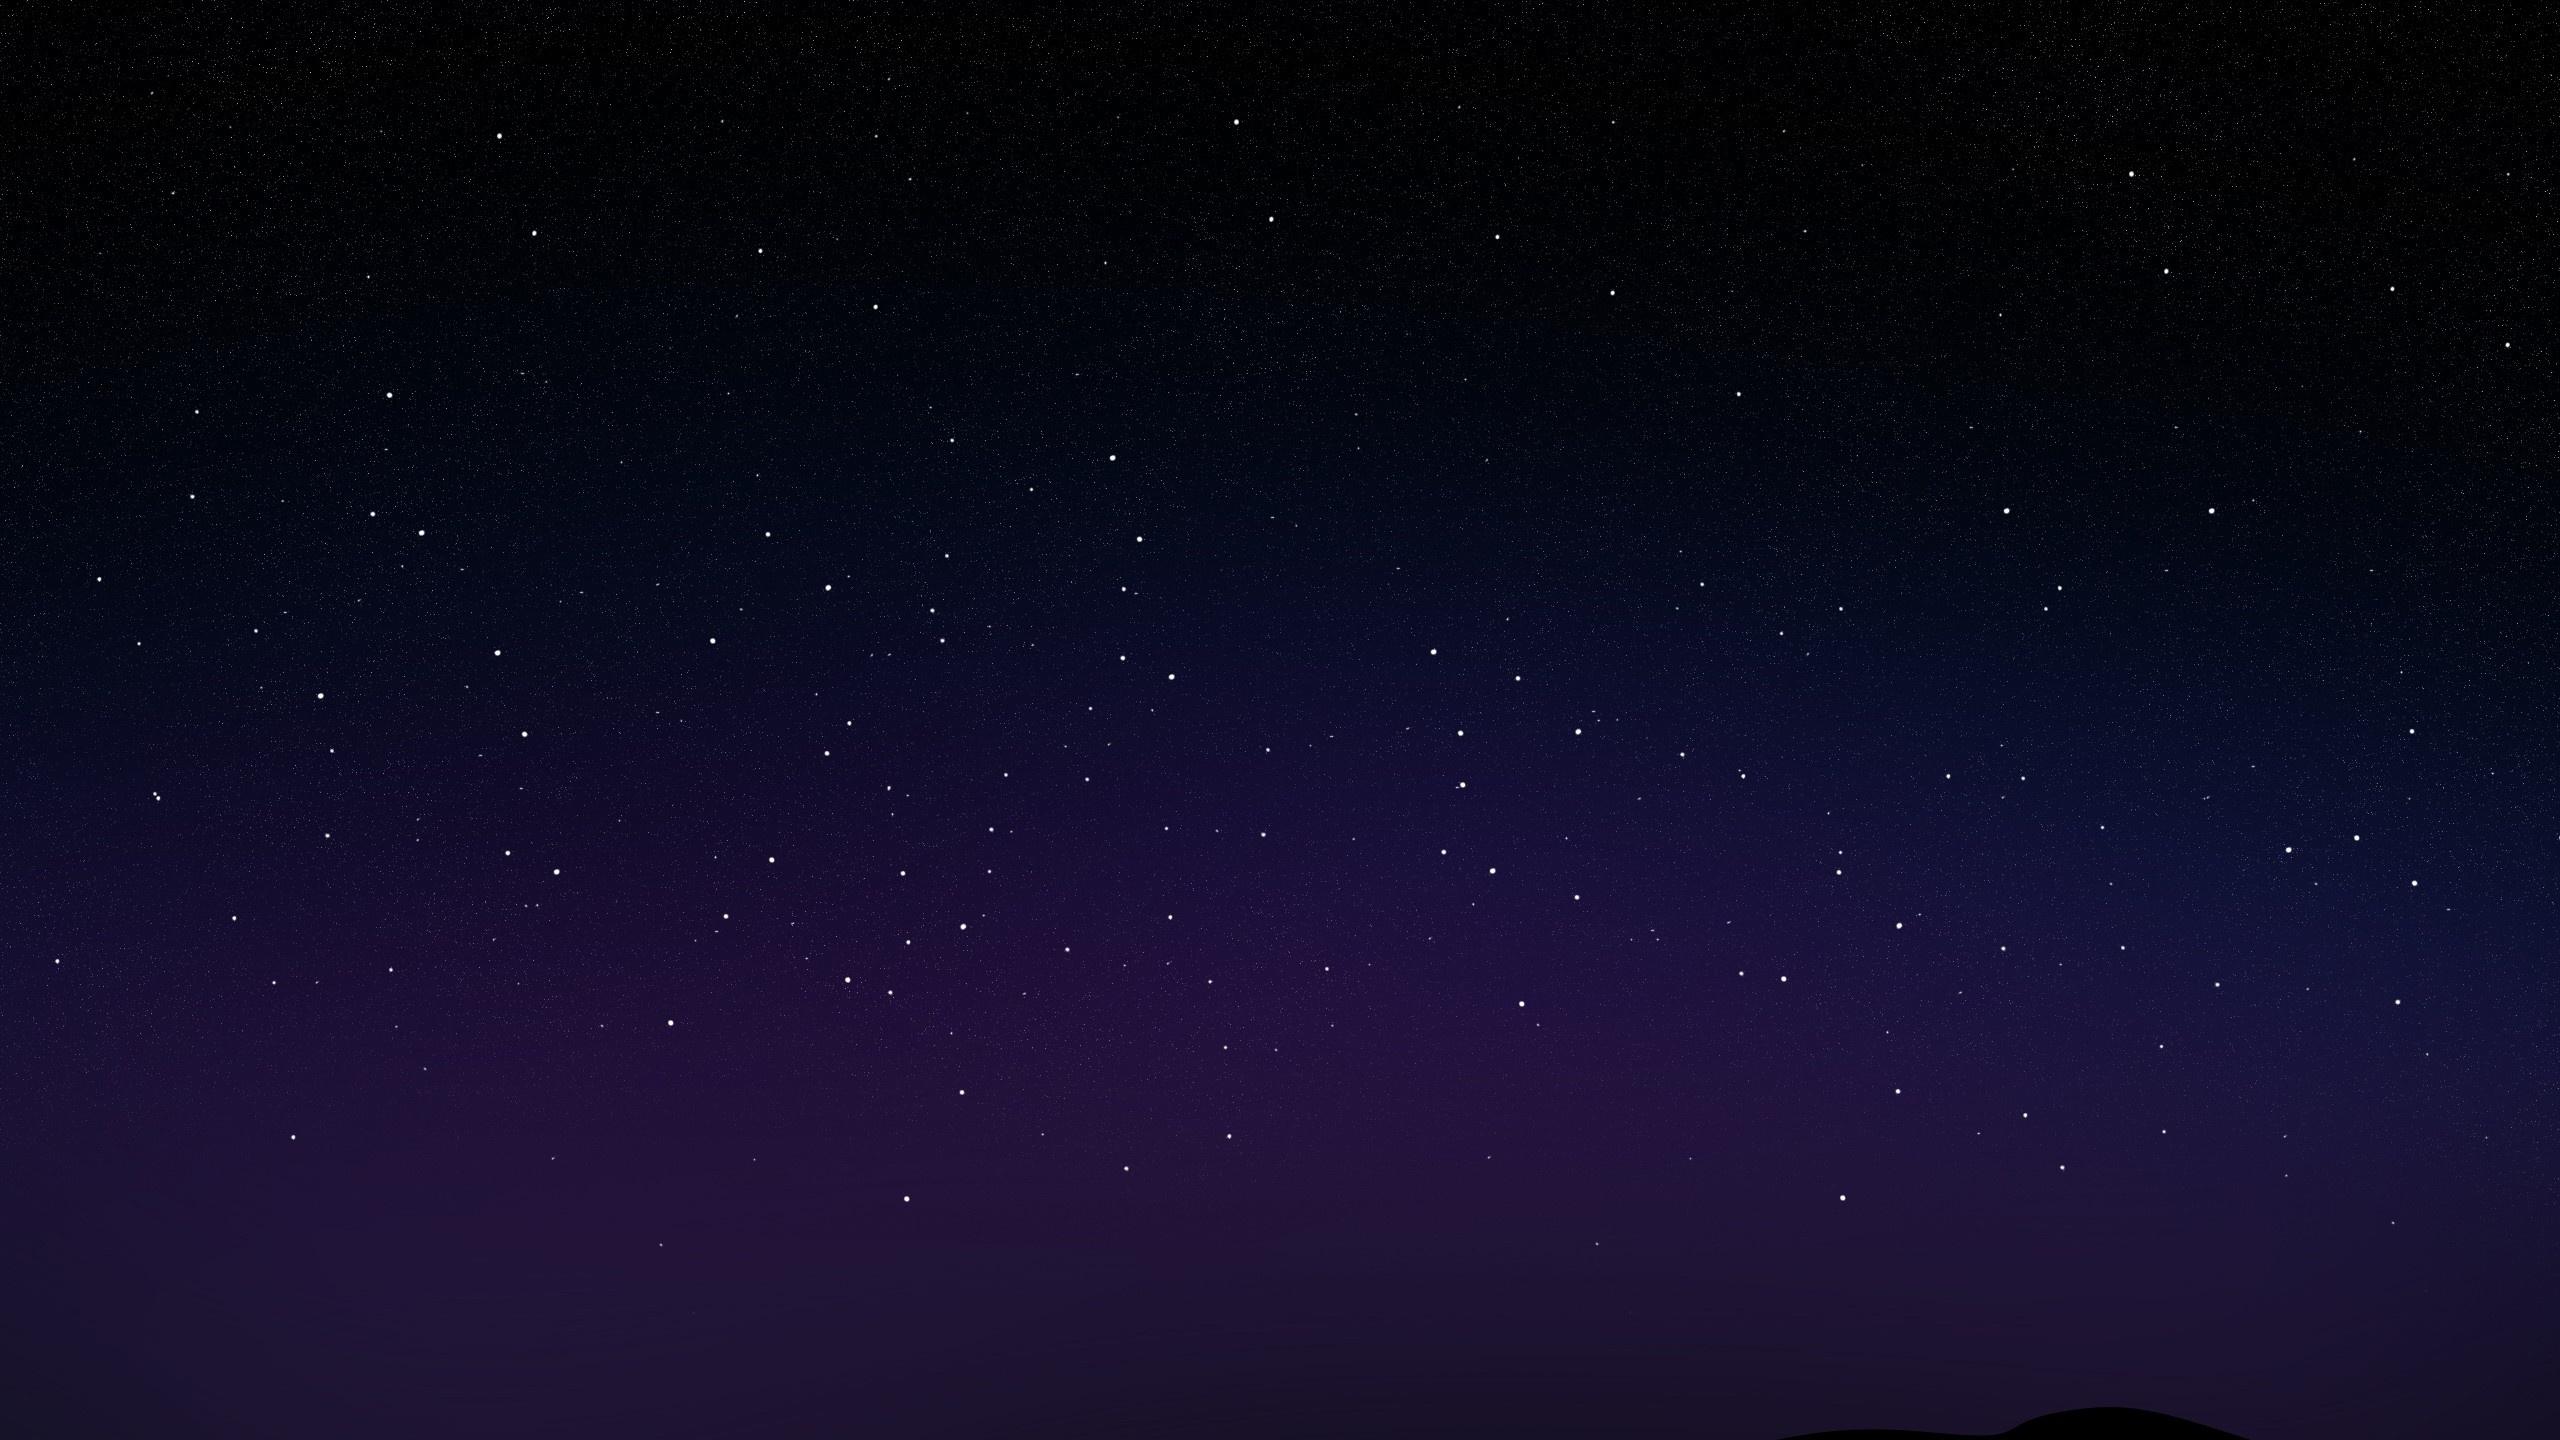 2560x1440 Starry Night Sky desktop PC and Mac wallpaper 2560x1440